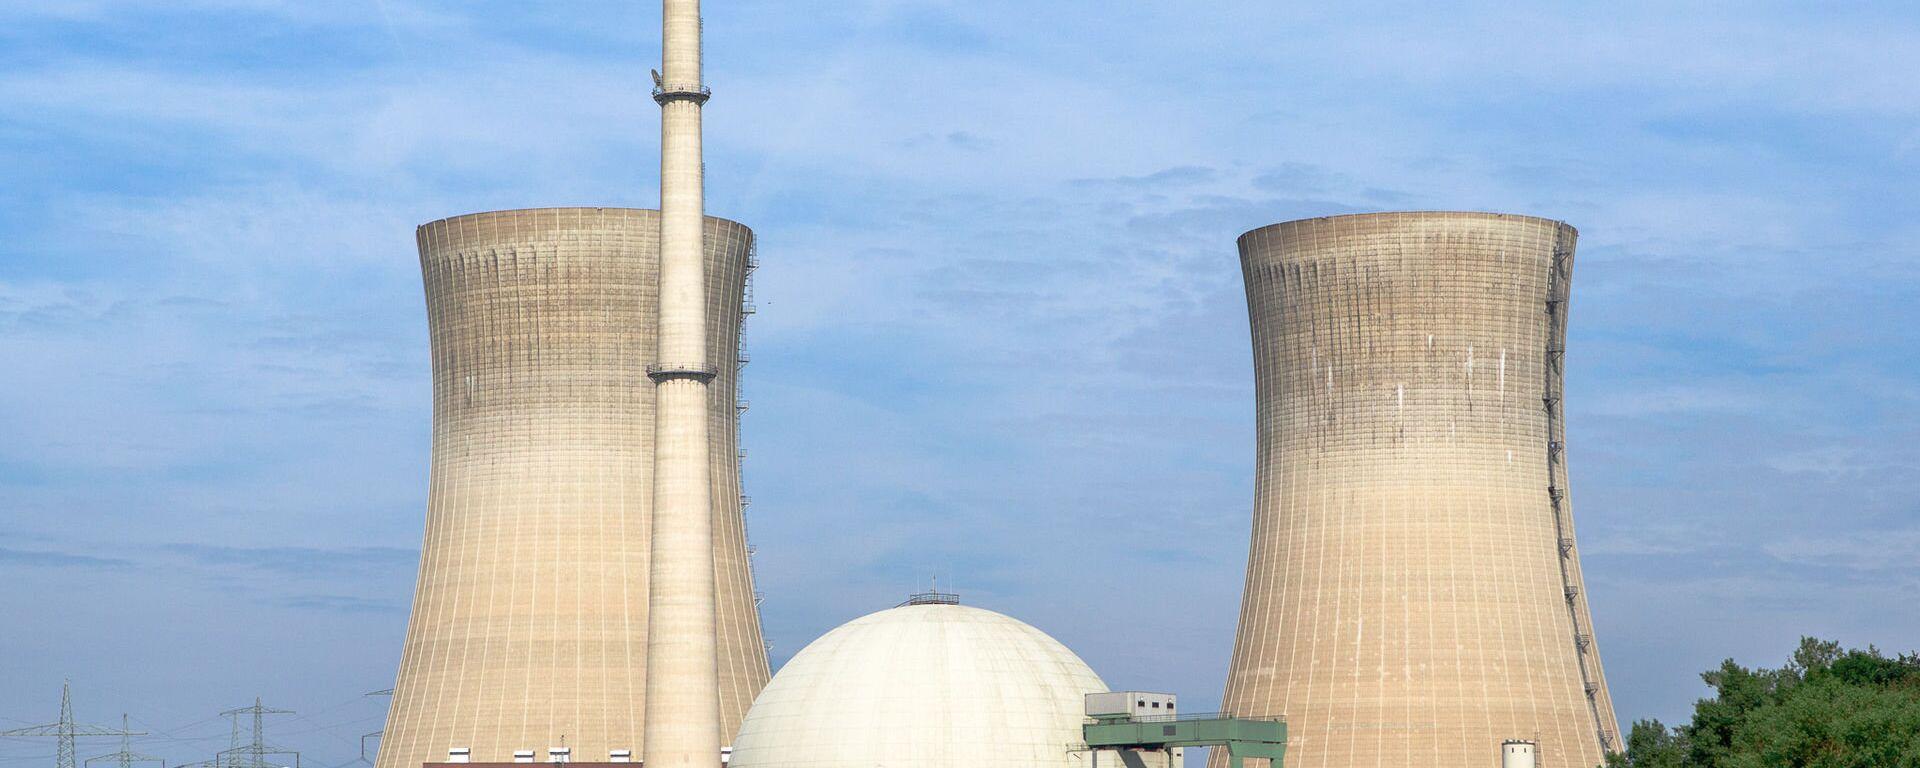 Nuklearna elektrana - Sputnik Srbija, 1920, 21.01.2021